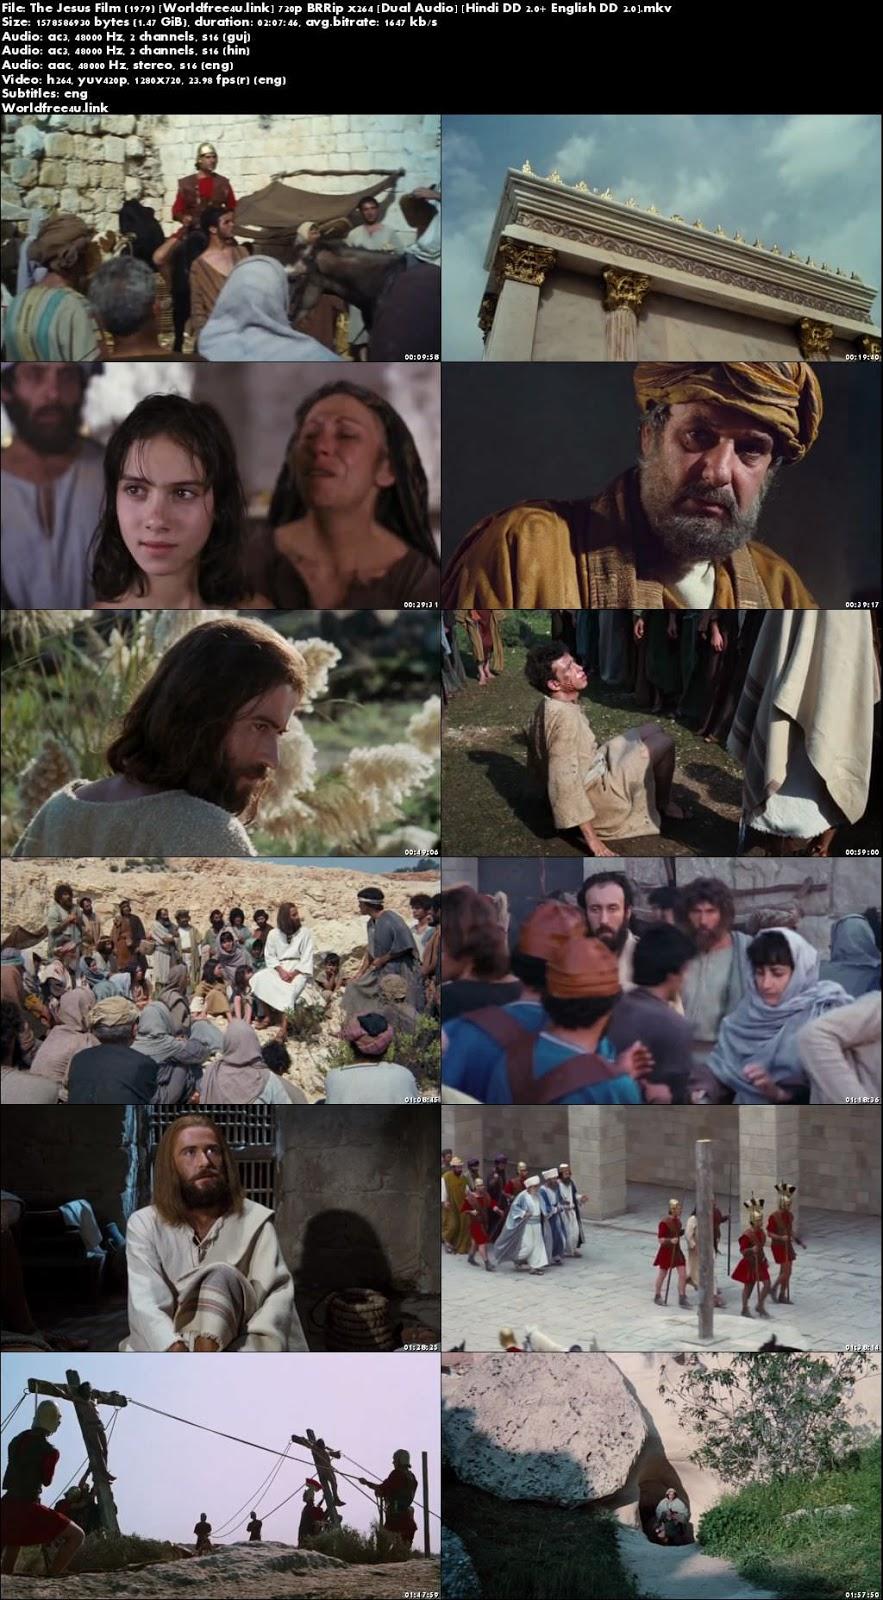 Free Download The Jesus Film 1979  720p Dual Audio In Hindi English